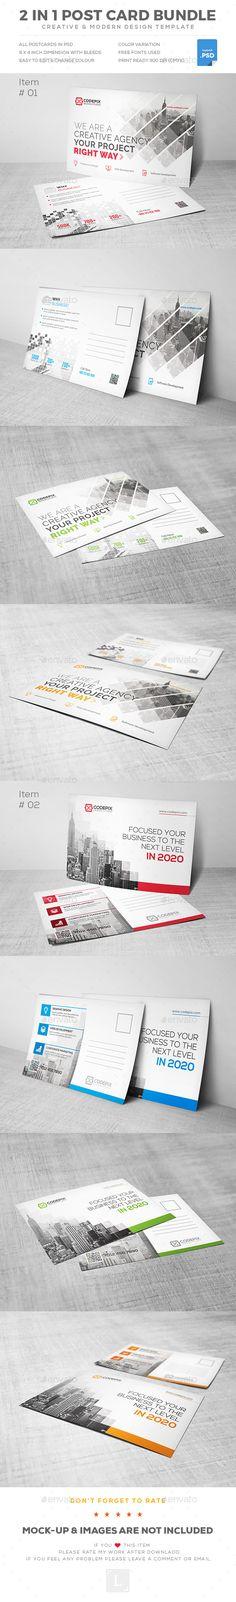 Postcard Bundle — Photoshop PSD #corporate #offline marketing • Download ➝ https://graphicriver.net/item/postcard-bundle/19261228?ref=pxcr